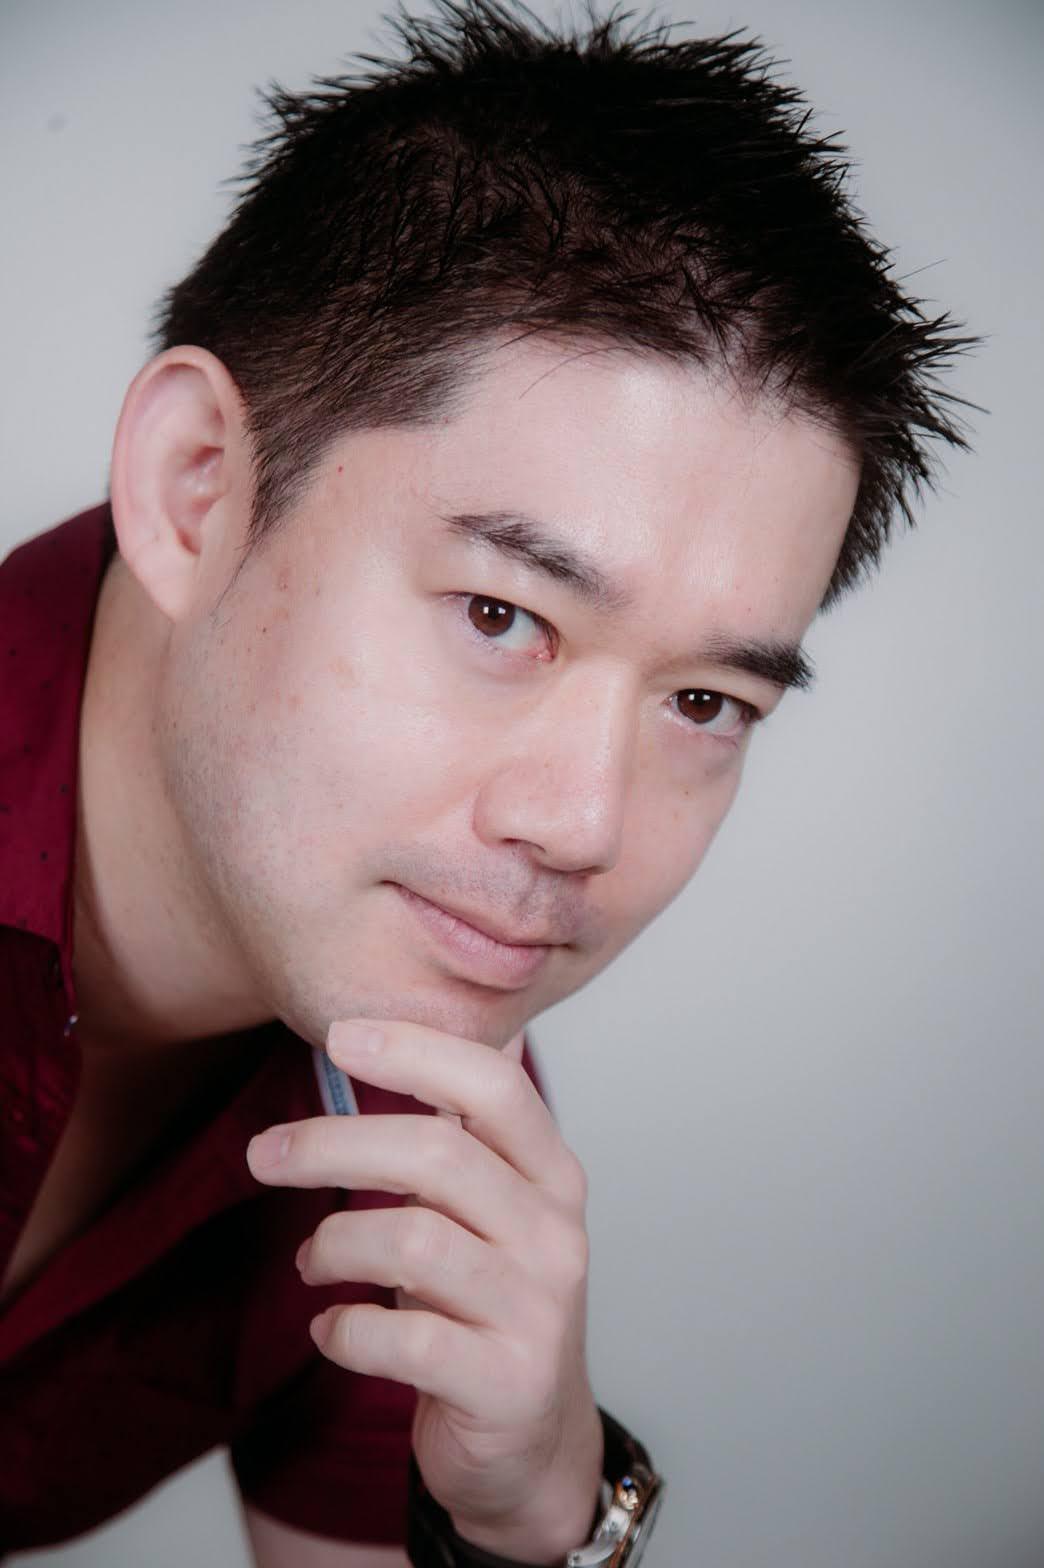 Nobu T Watanabe 41